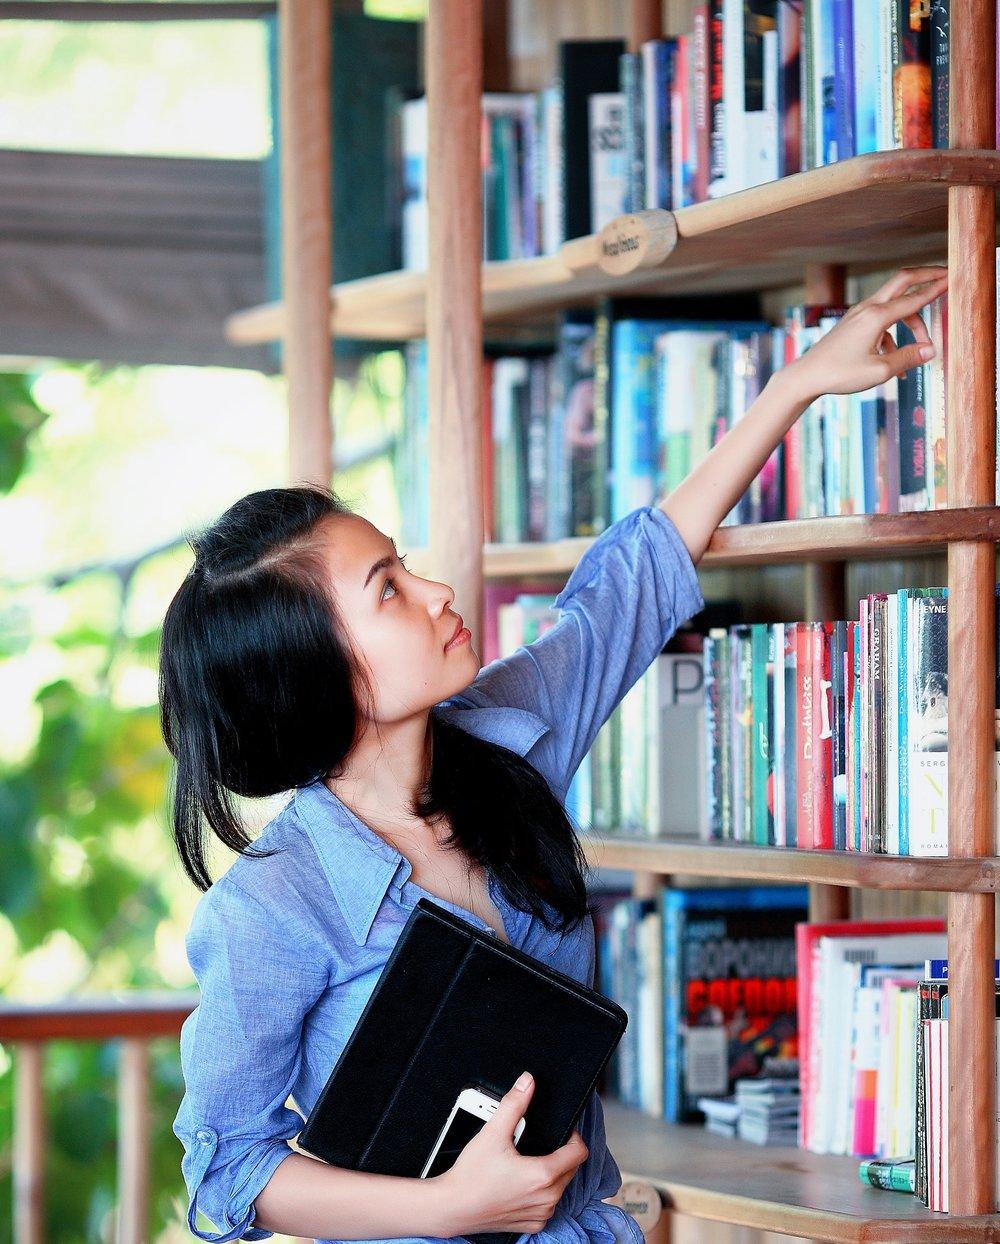 academic-adolescent-bookcase-207708.jpg